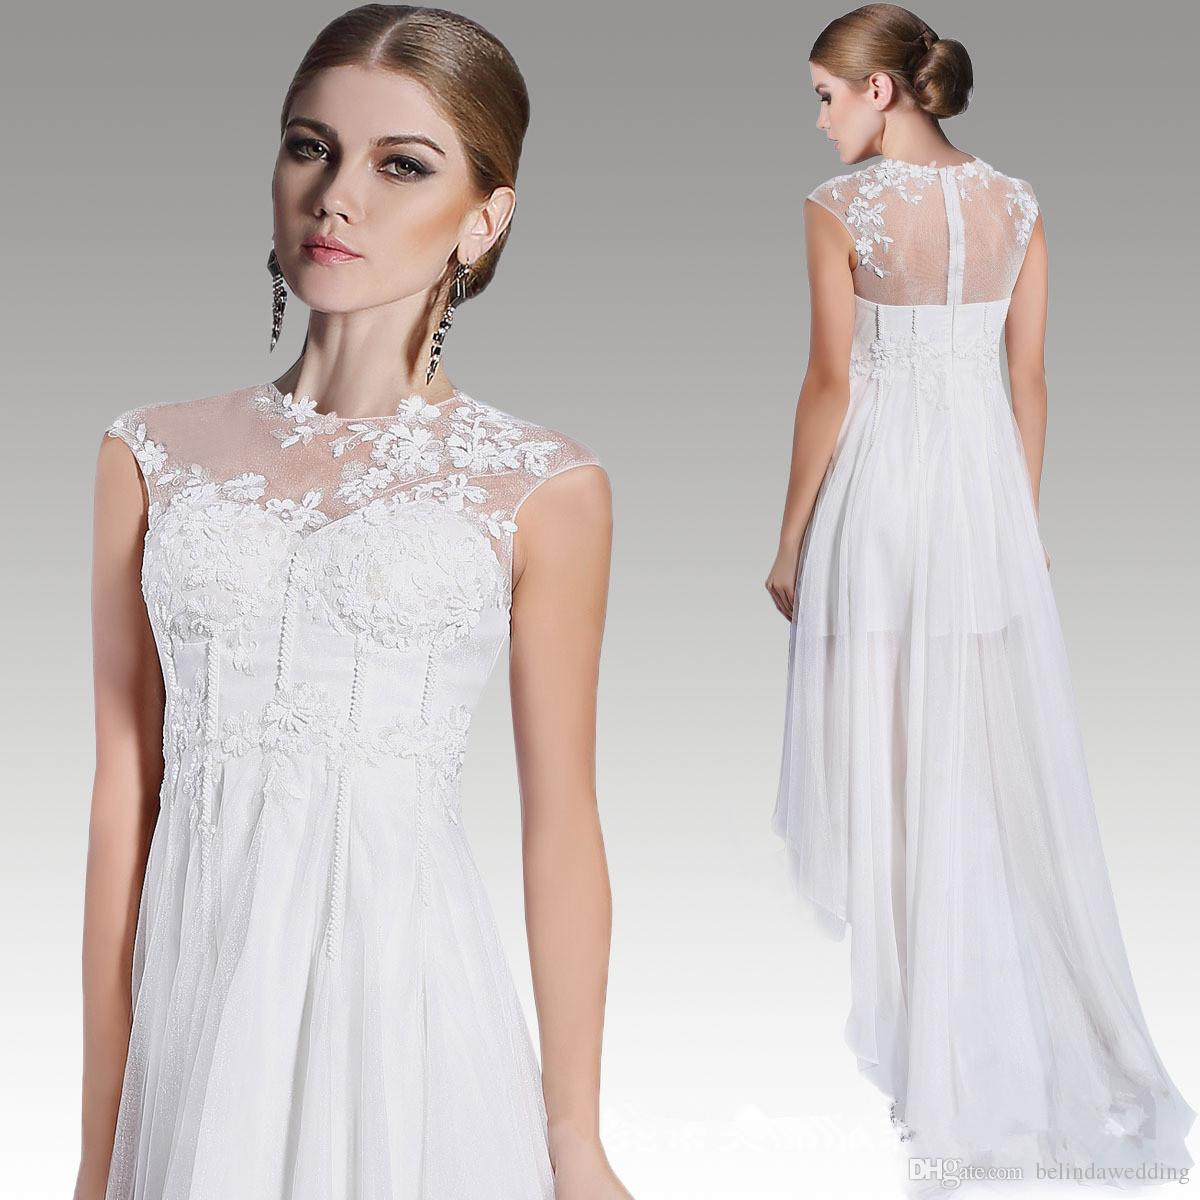 2016 White Dresses Evening Wear A Line Elegant Long Prom Dresses ...